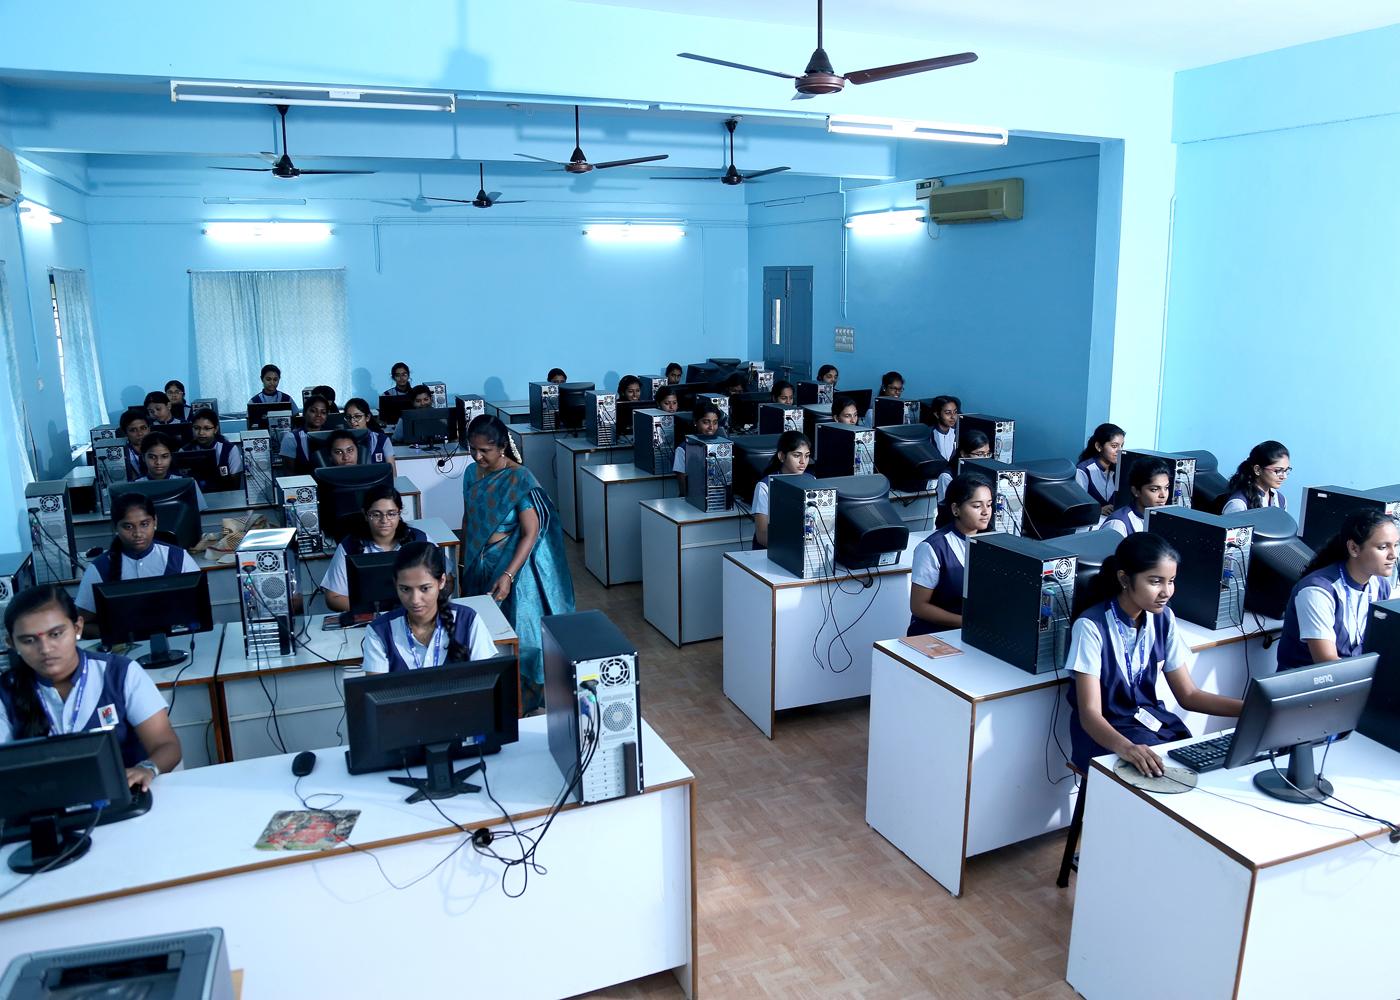 facilities_image